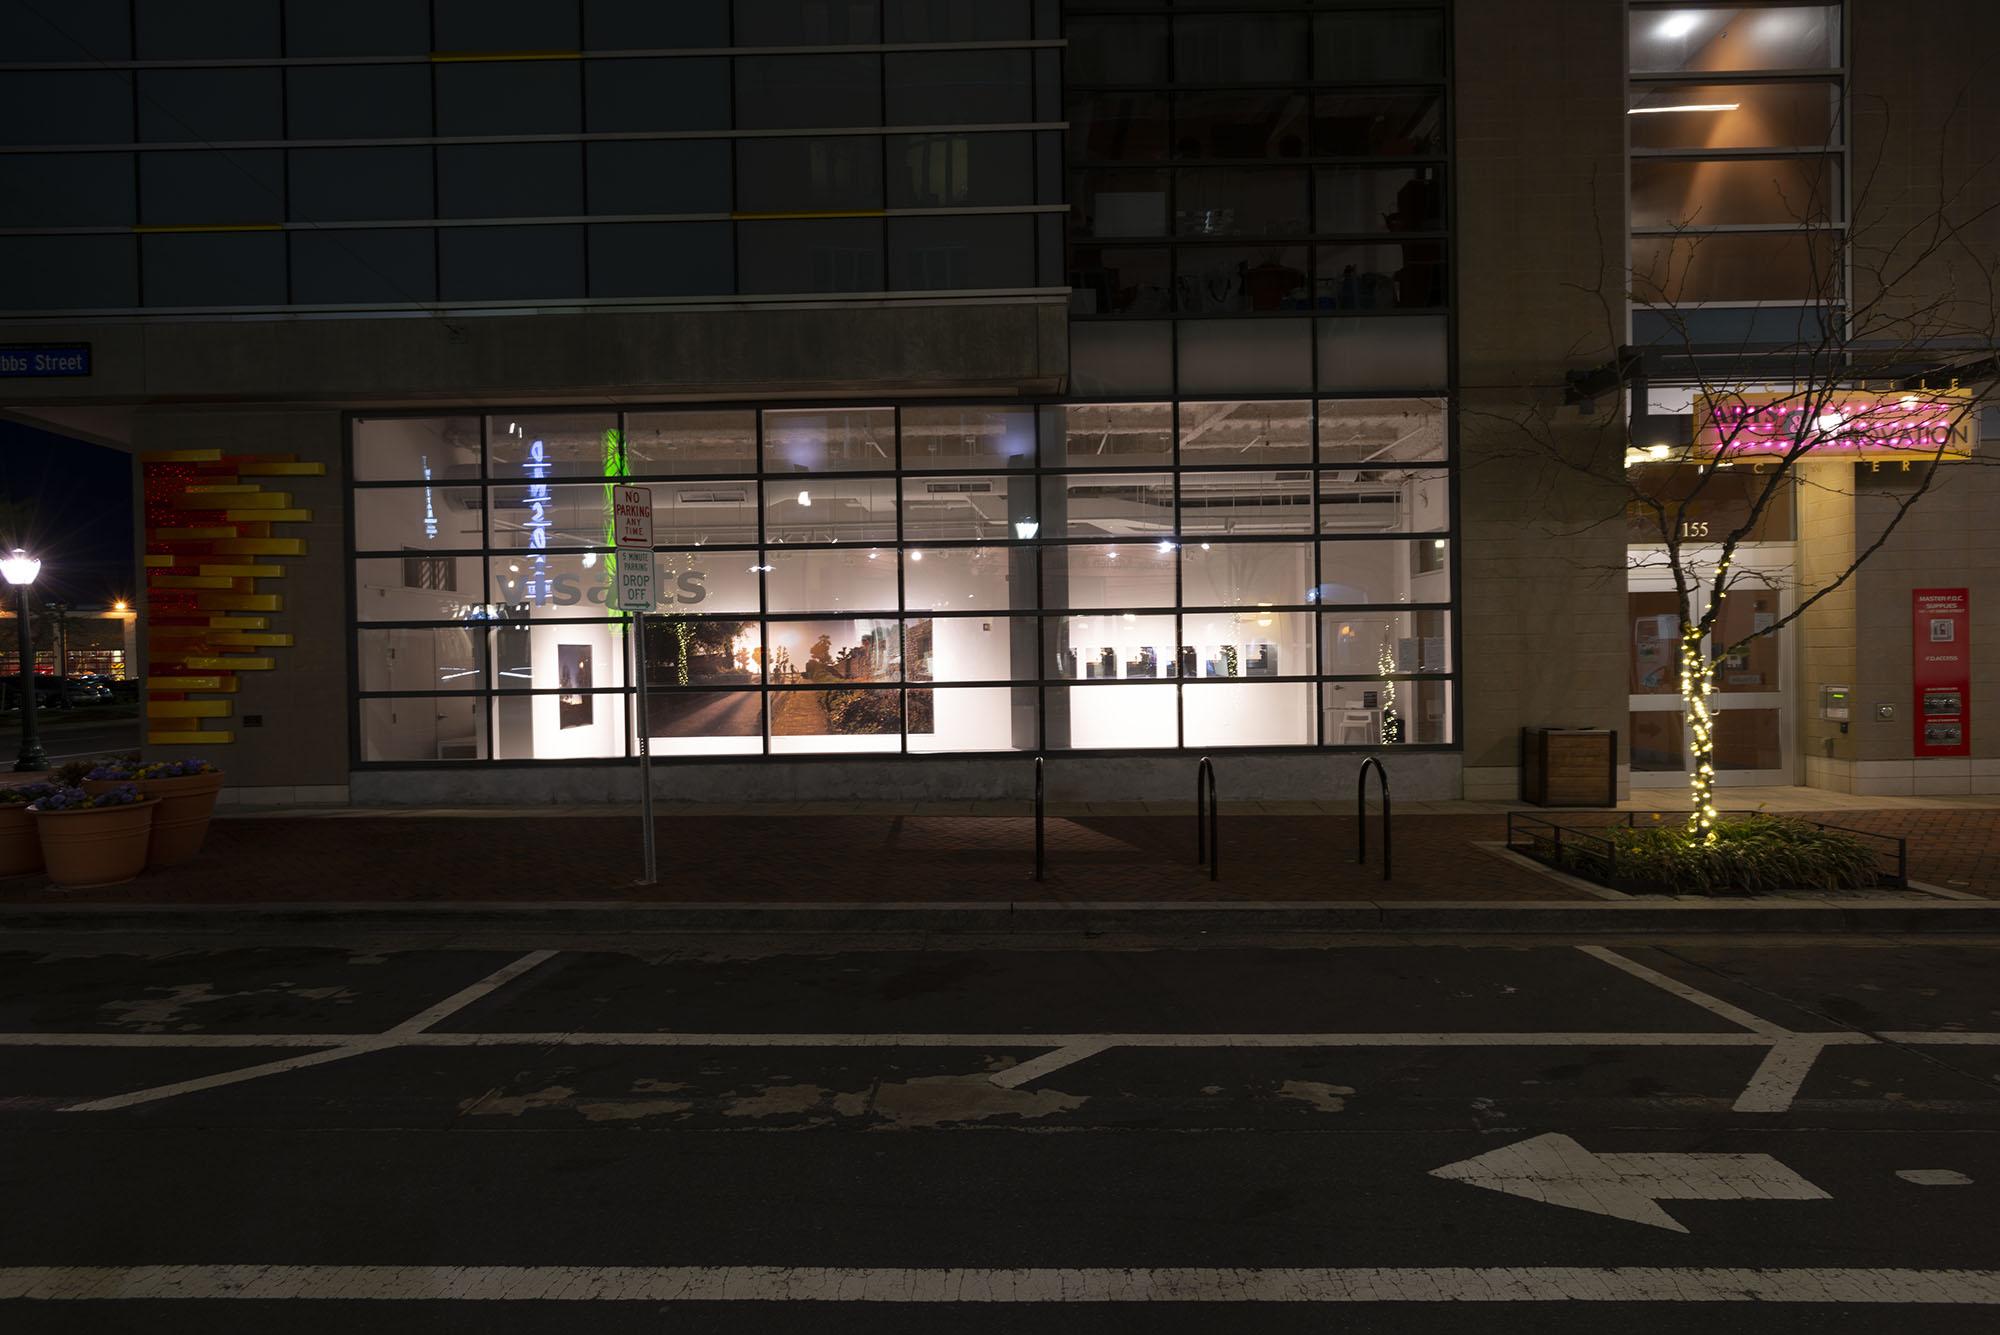 TwiLight  at Visart, Rockville, Maryland, 2018  Street view